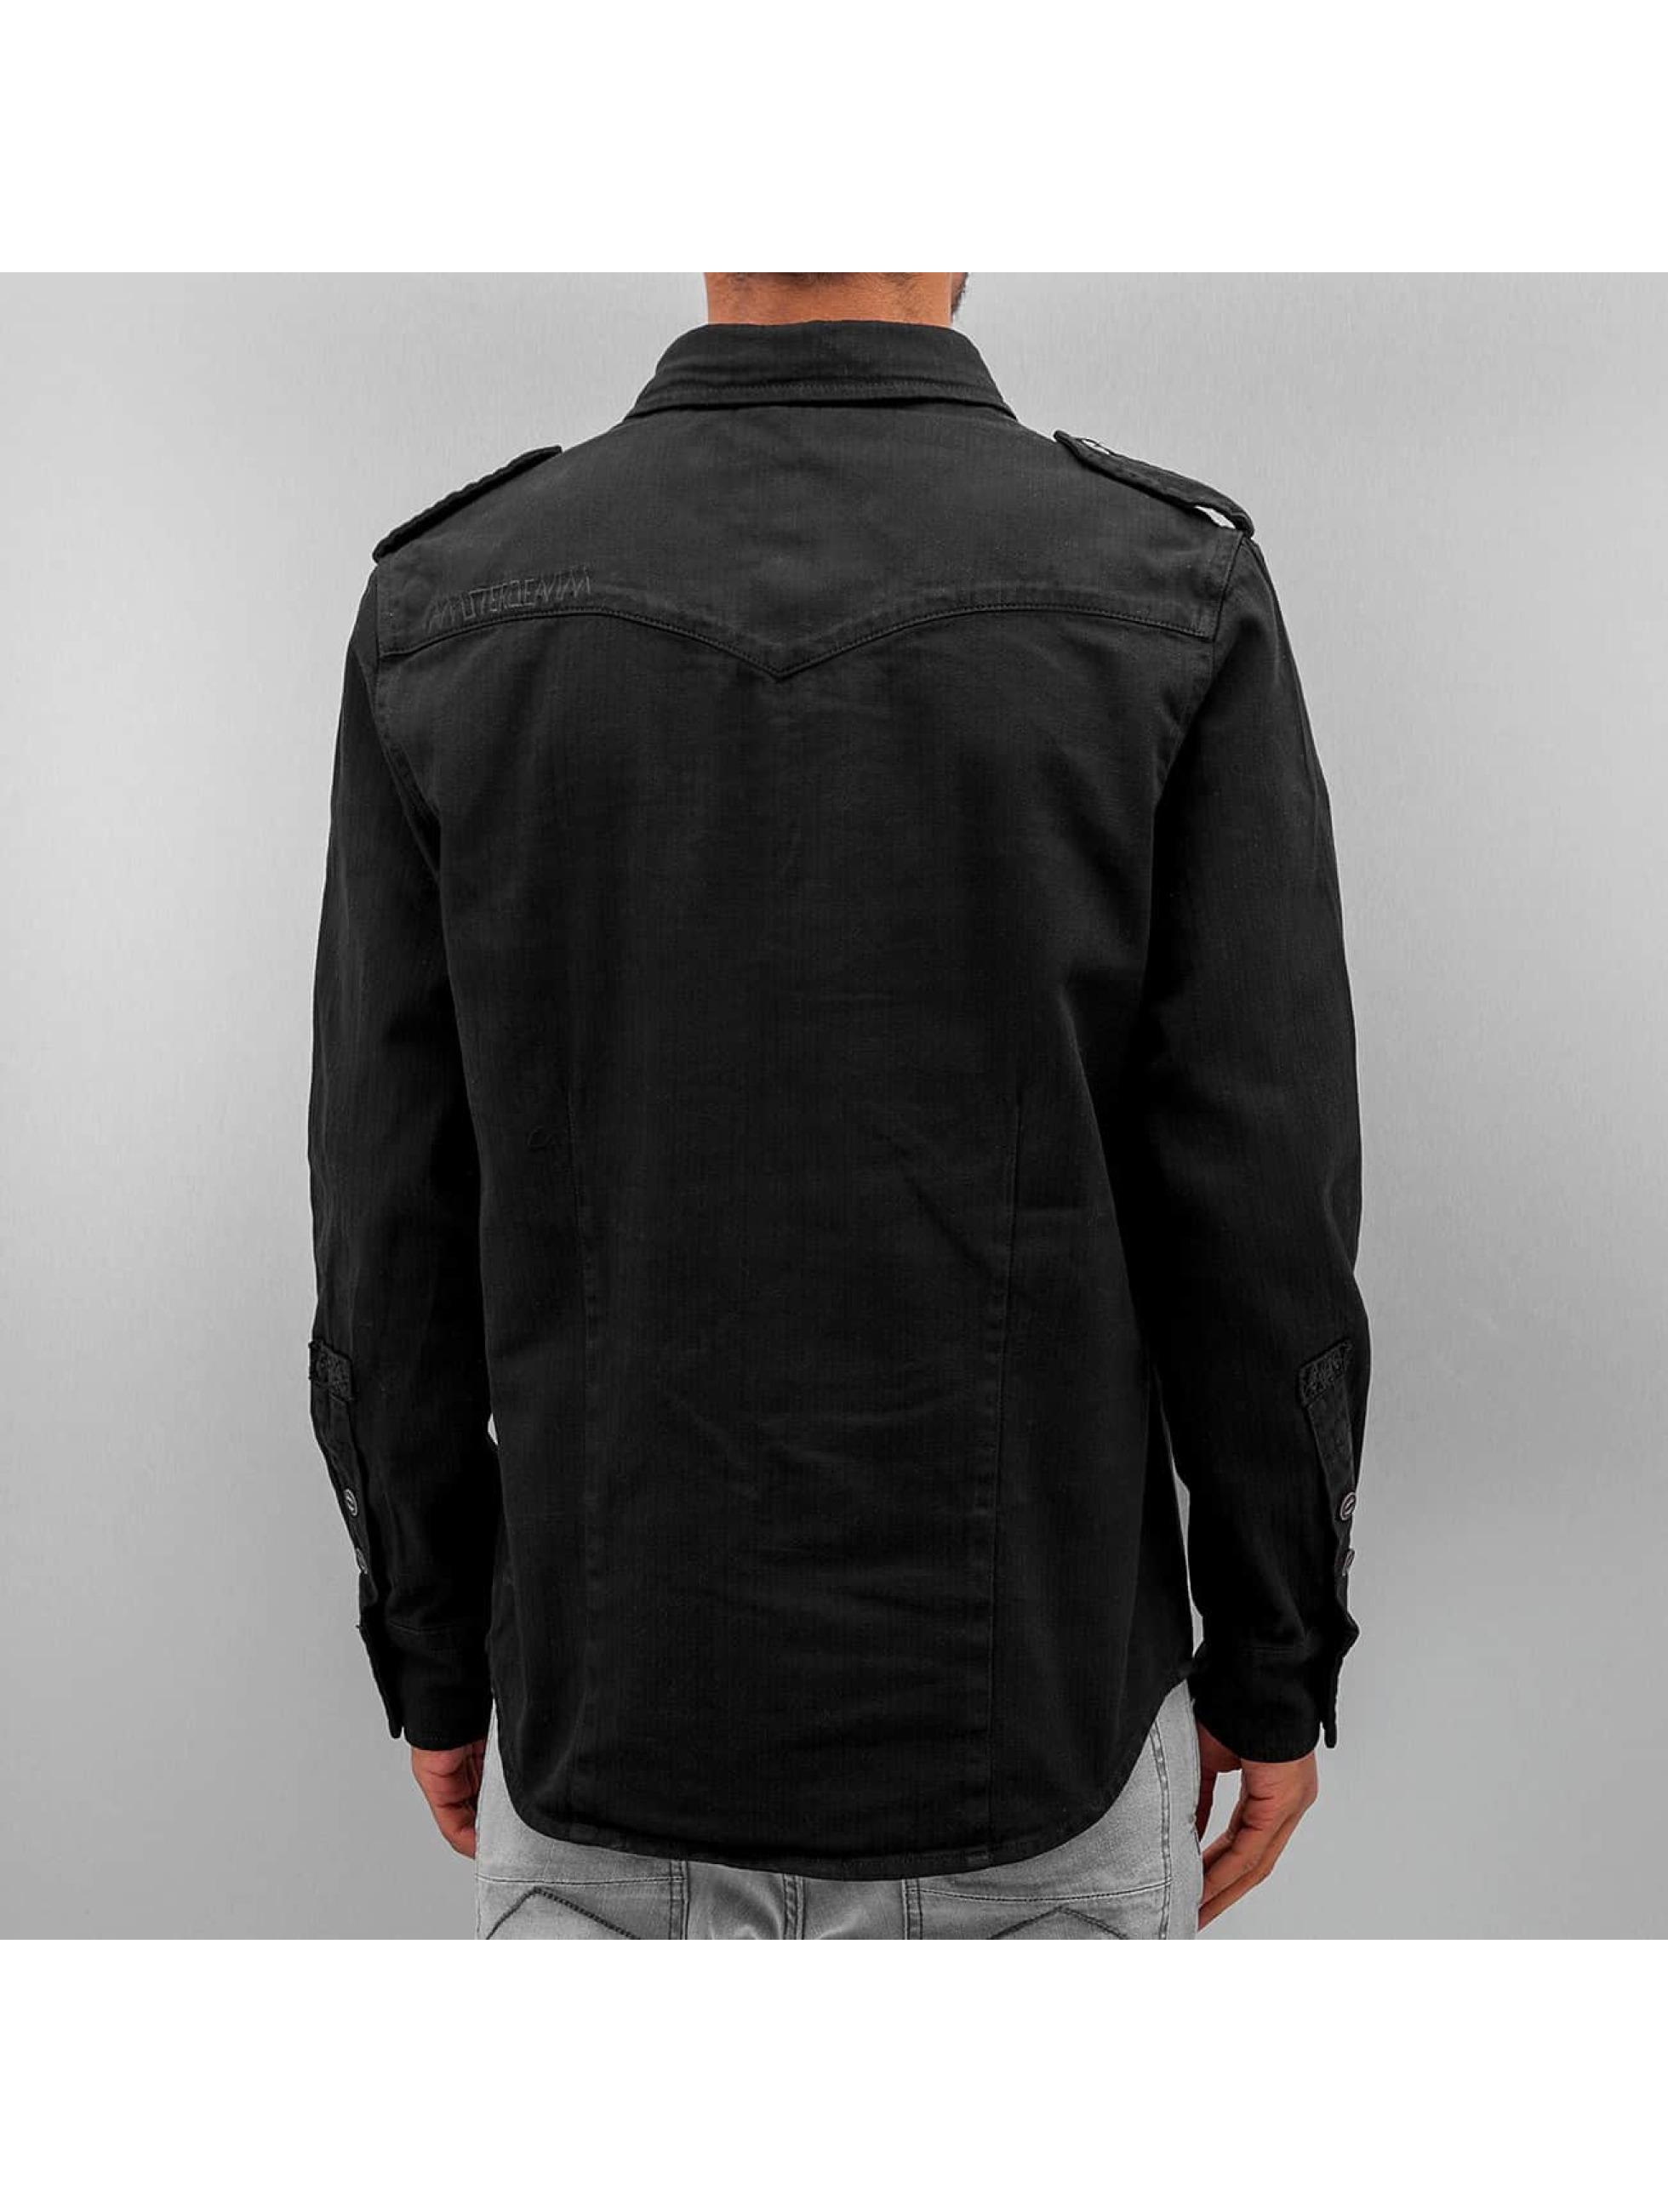 Amsterdenim Shirt Tinus black